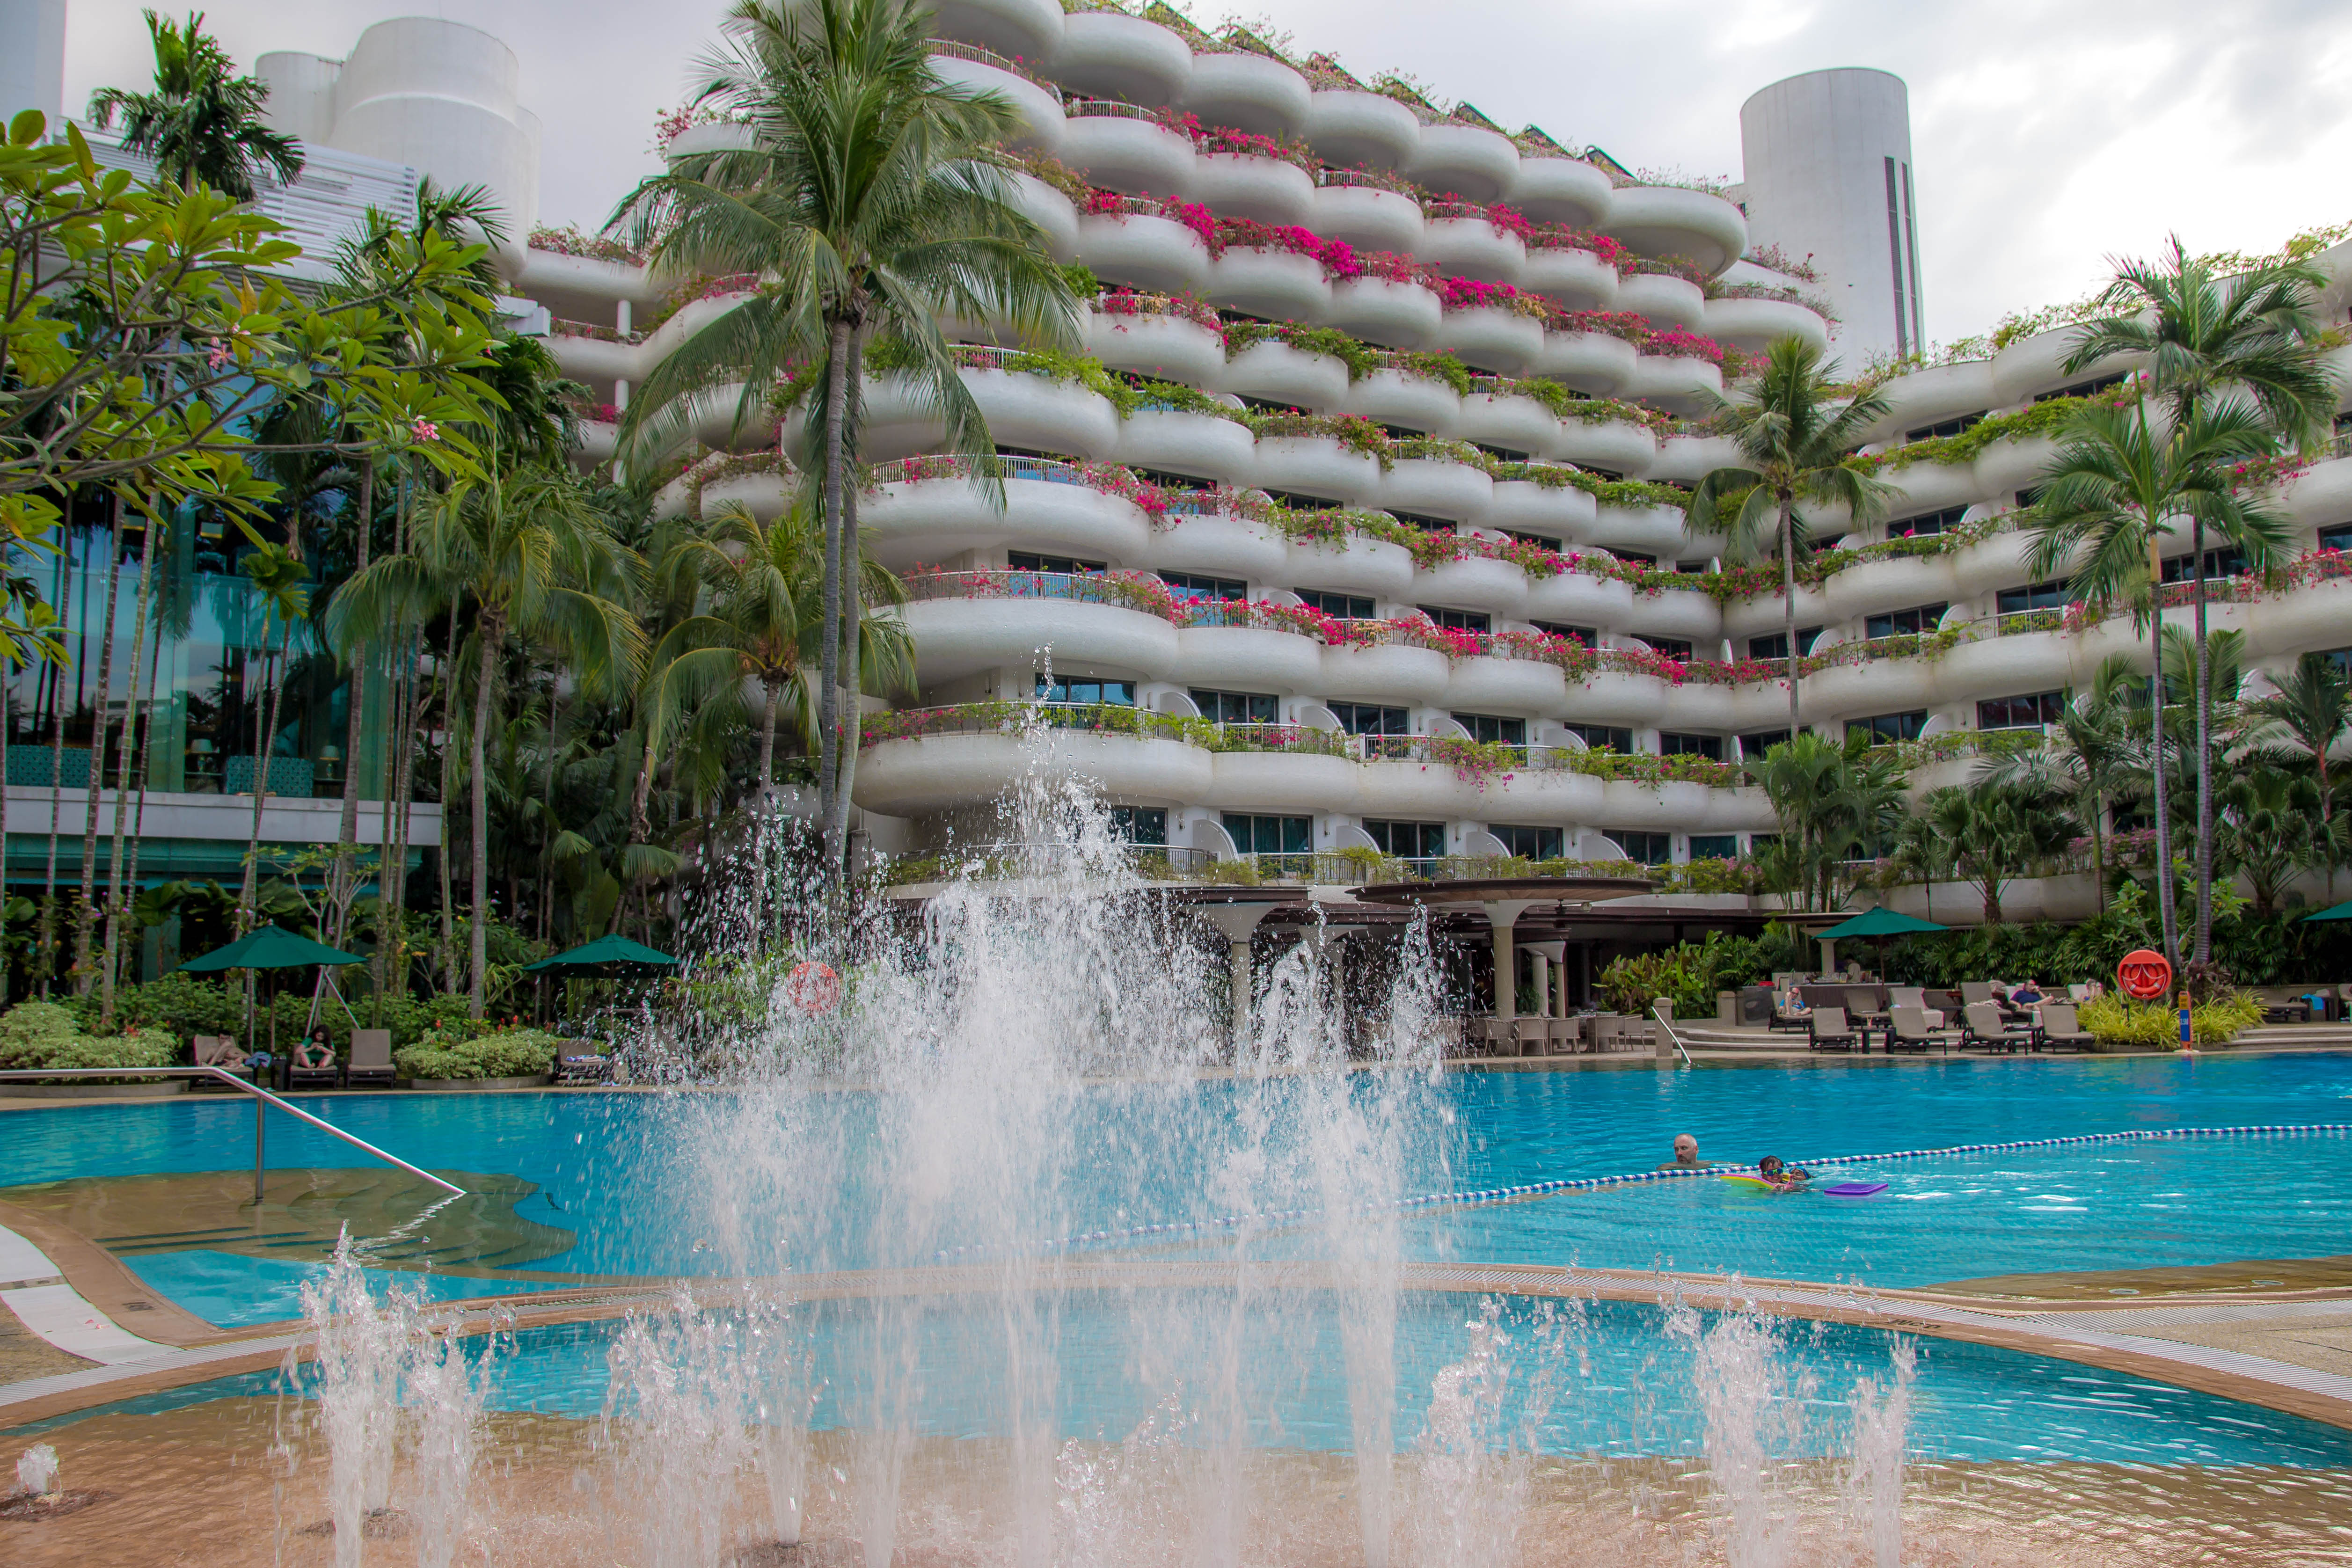 Shangri-la Singapura